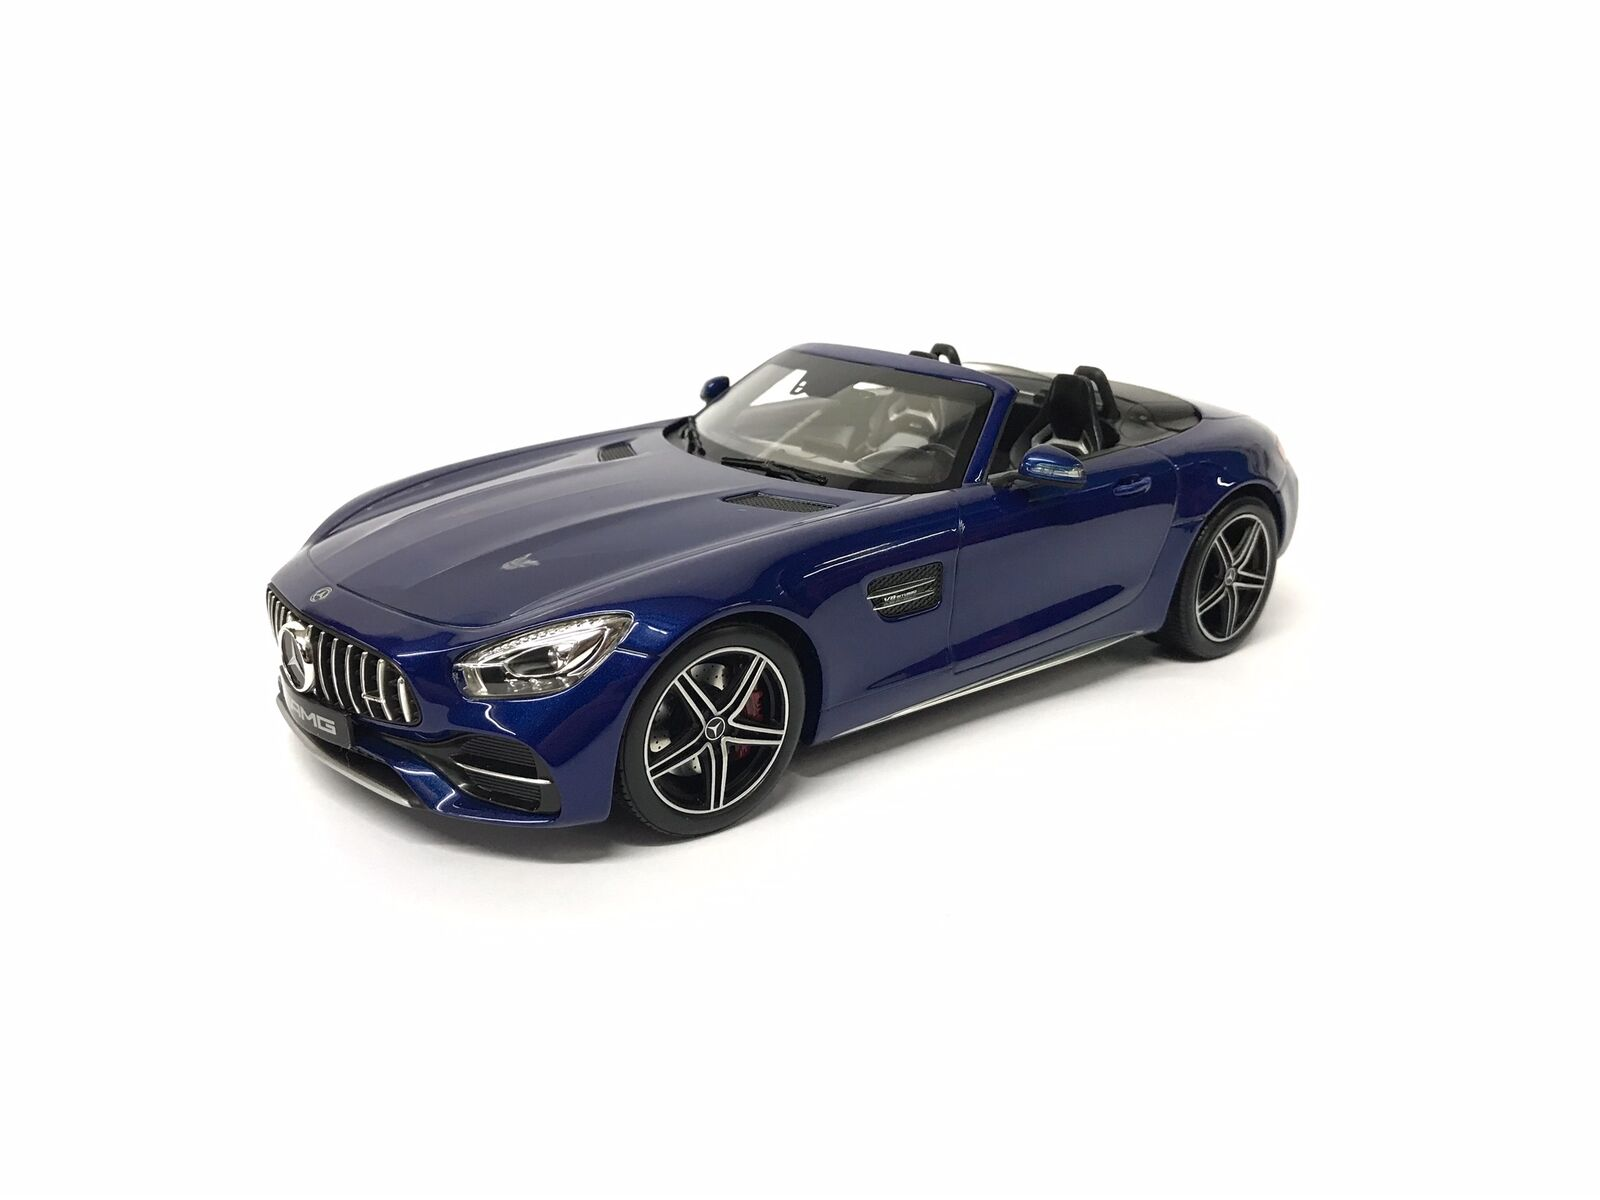 Mercedes Benz AMG GT C, b66960443 brilliantblau, 1 18 - norev